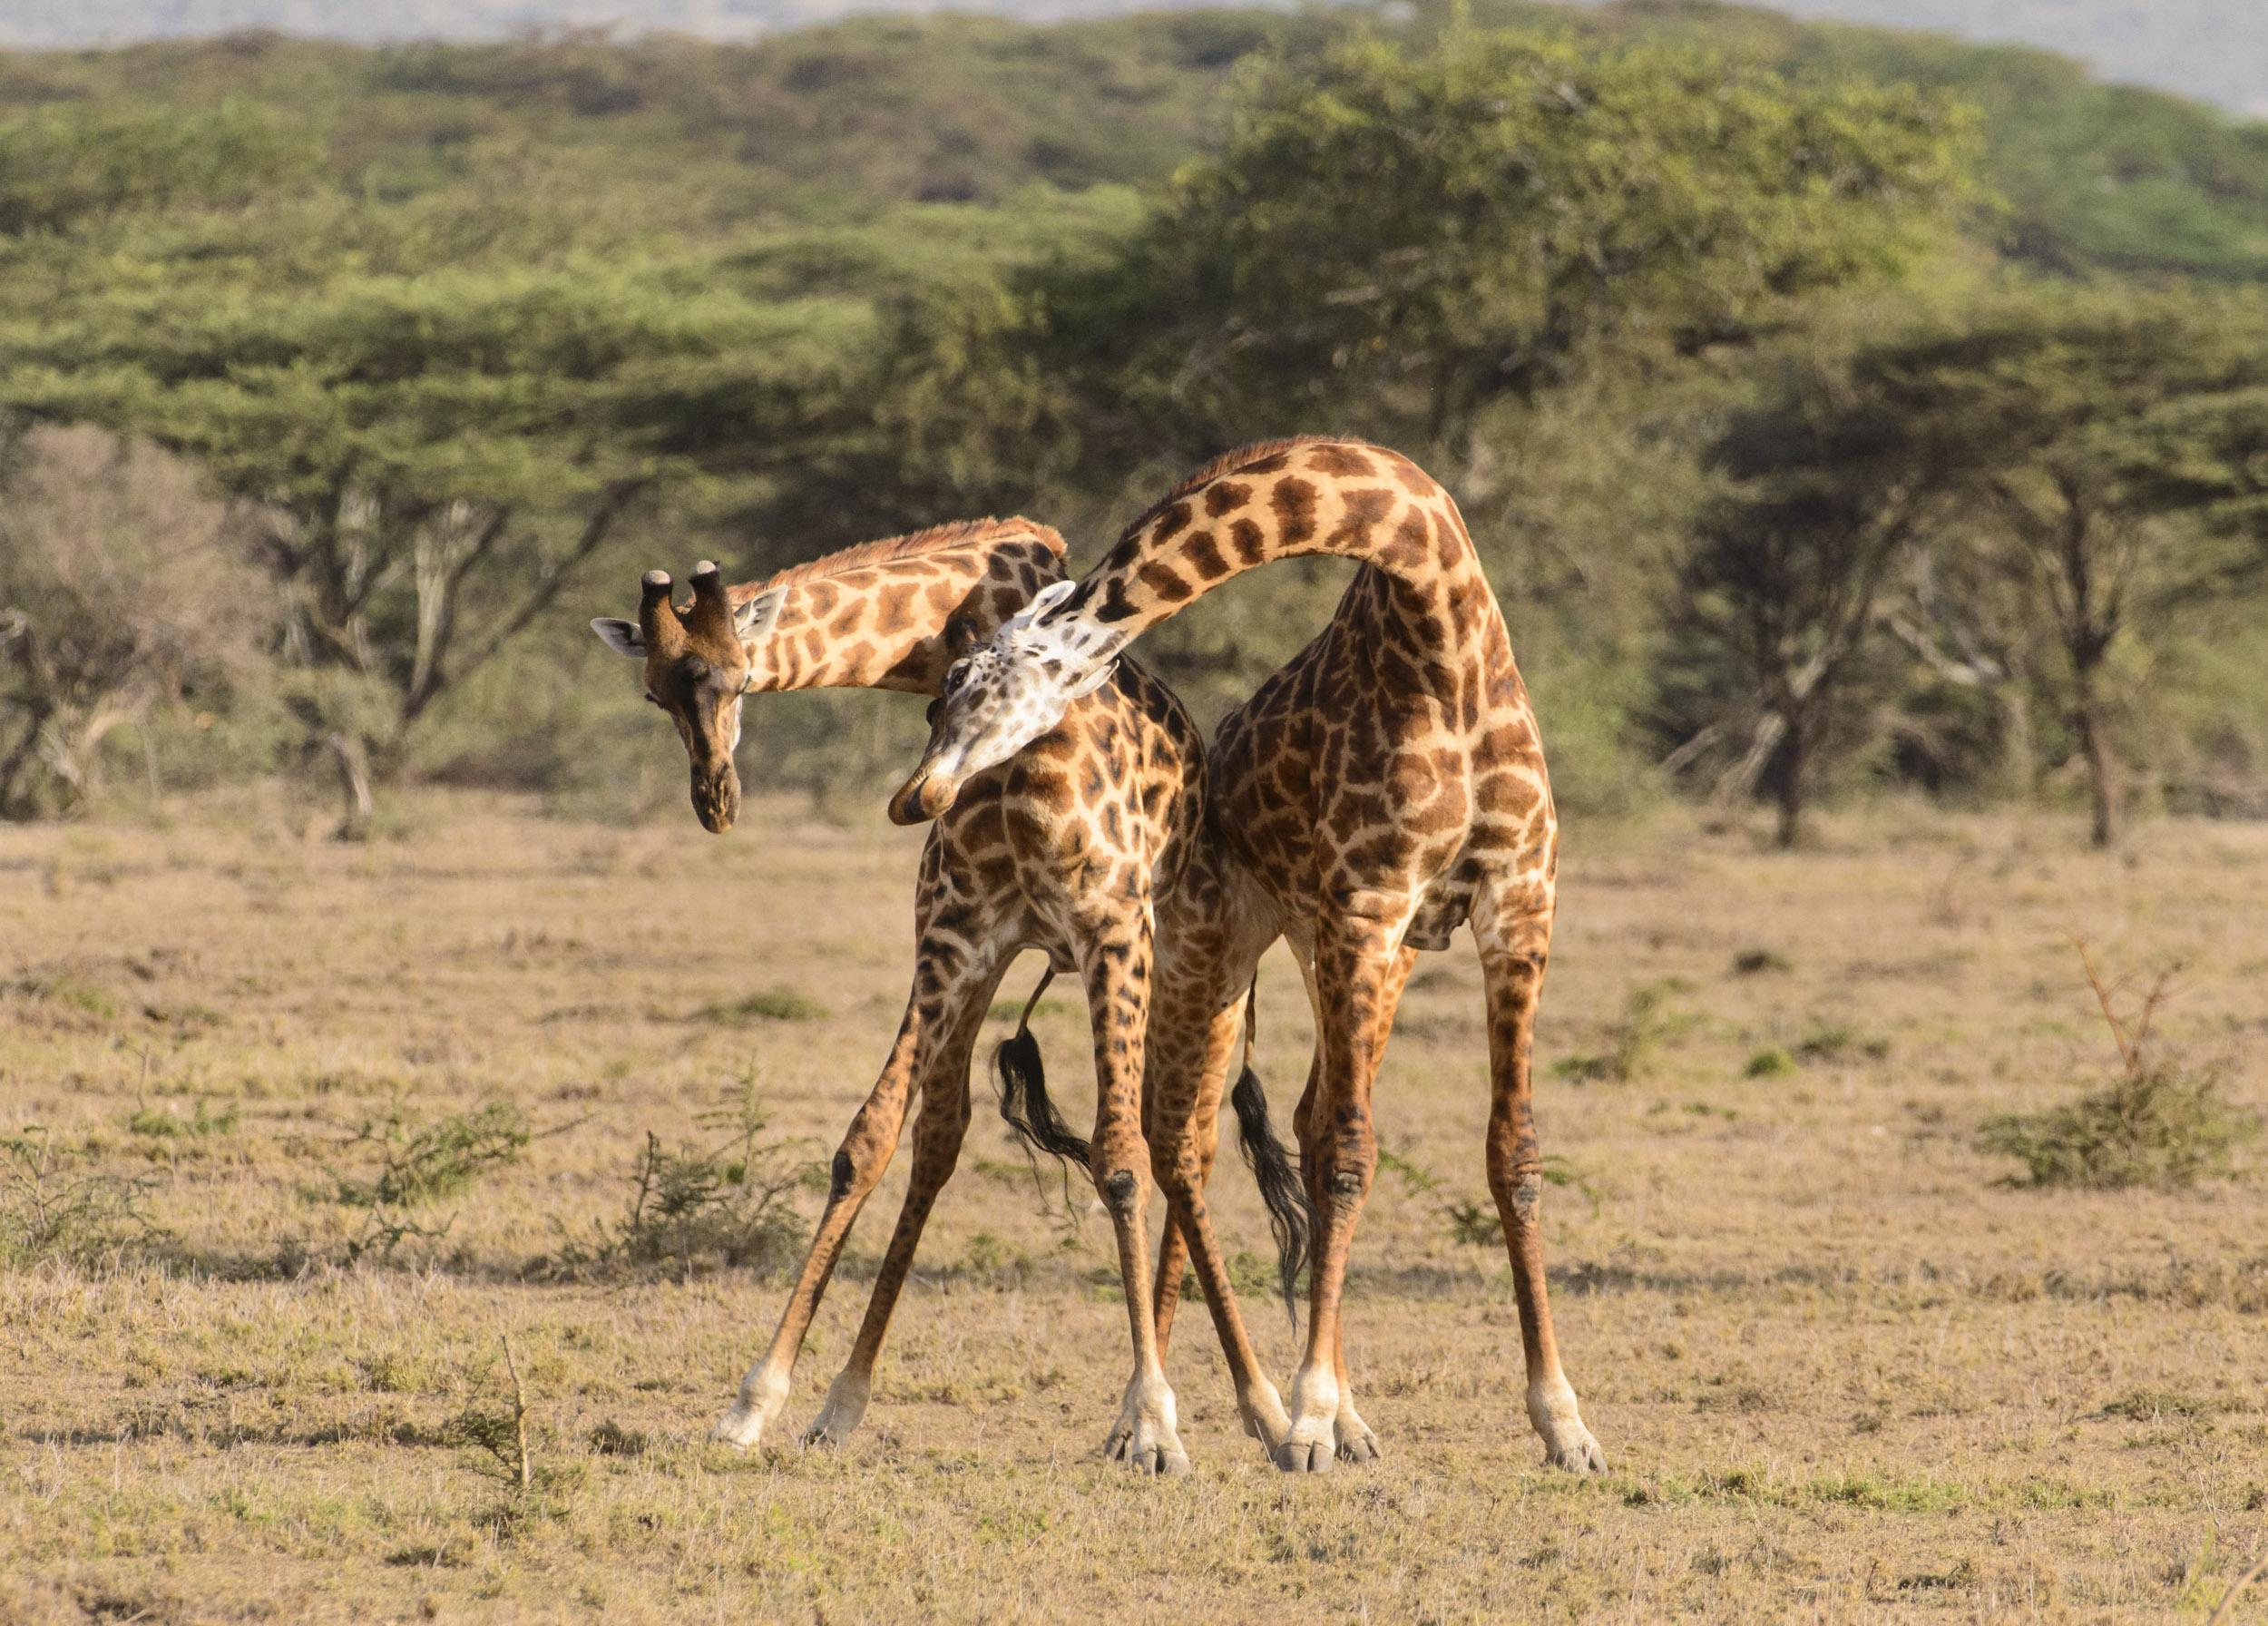 Giraffe (Giraffa camelopardalis), two males fighting with their necks, Ol Kinyei Conservancy, Kenya, 07/14. Cropped